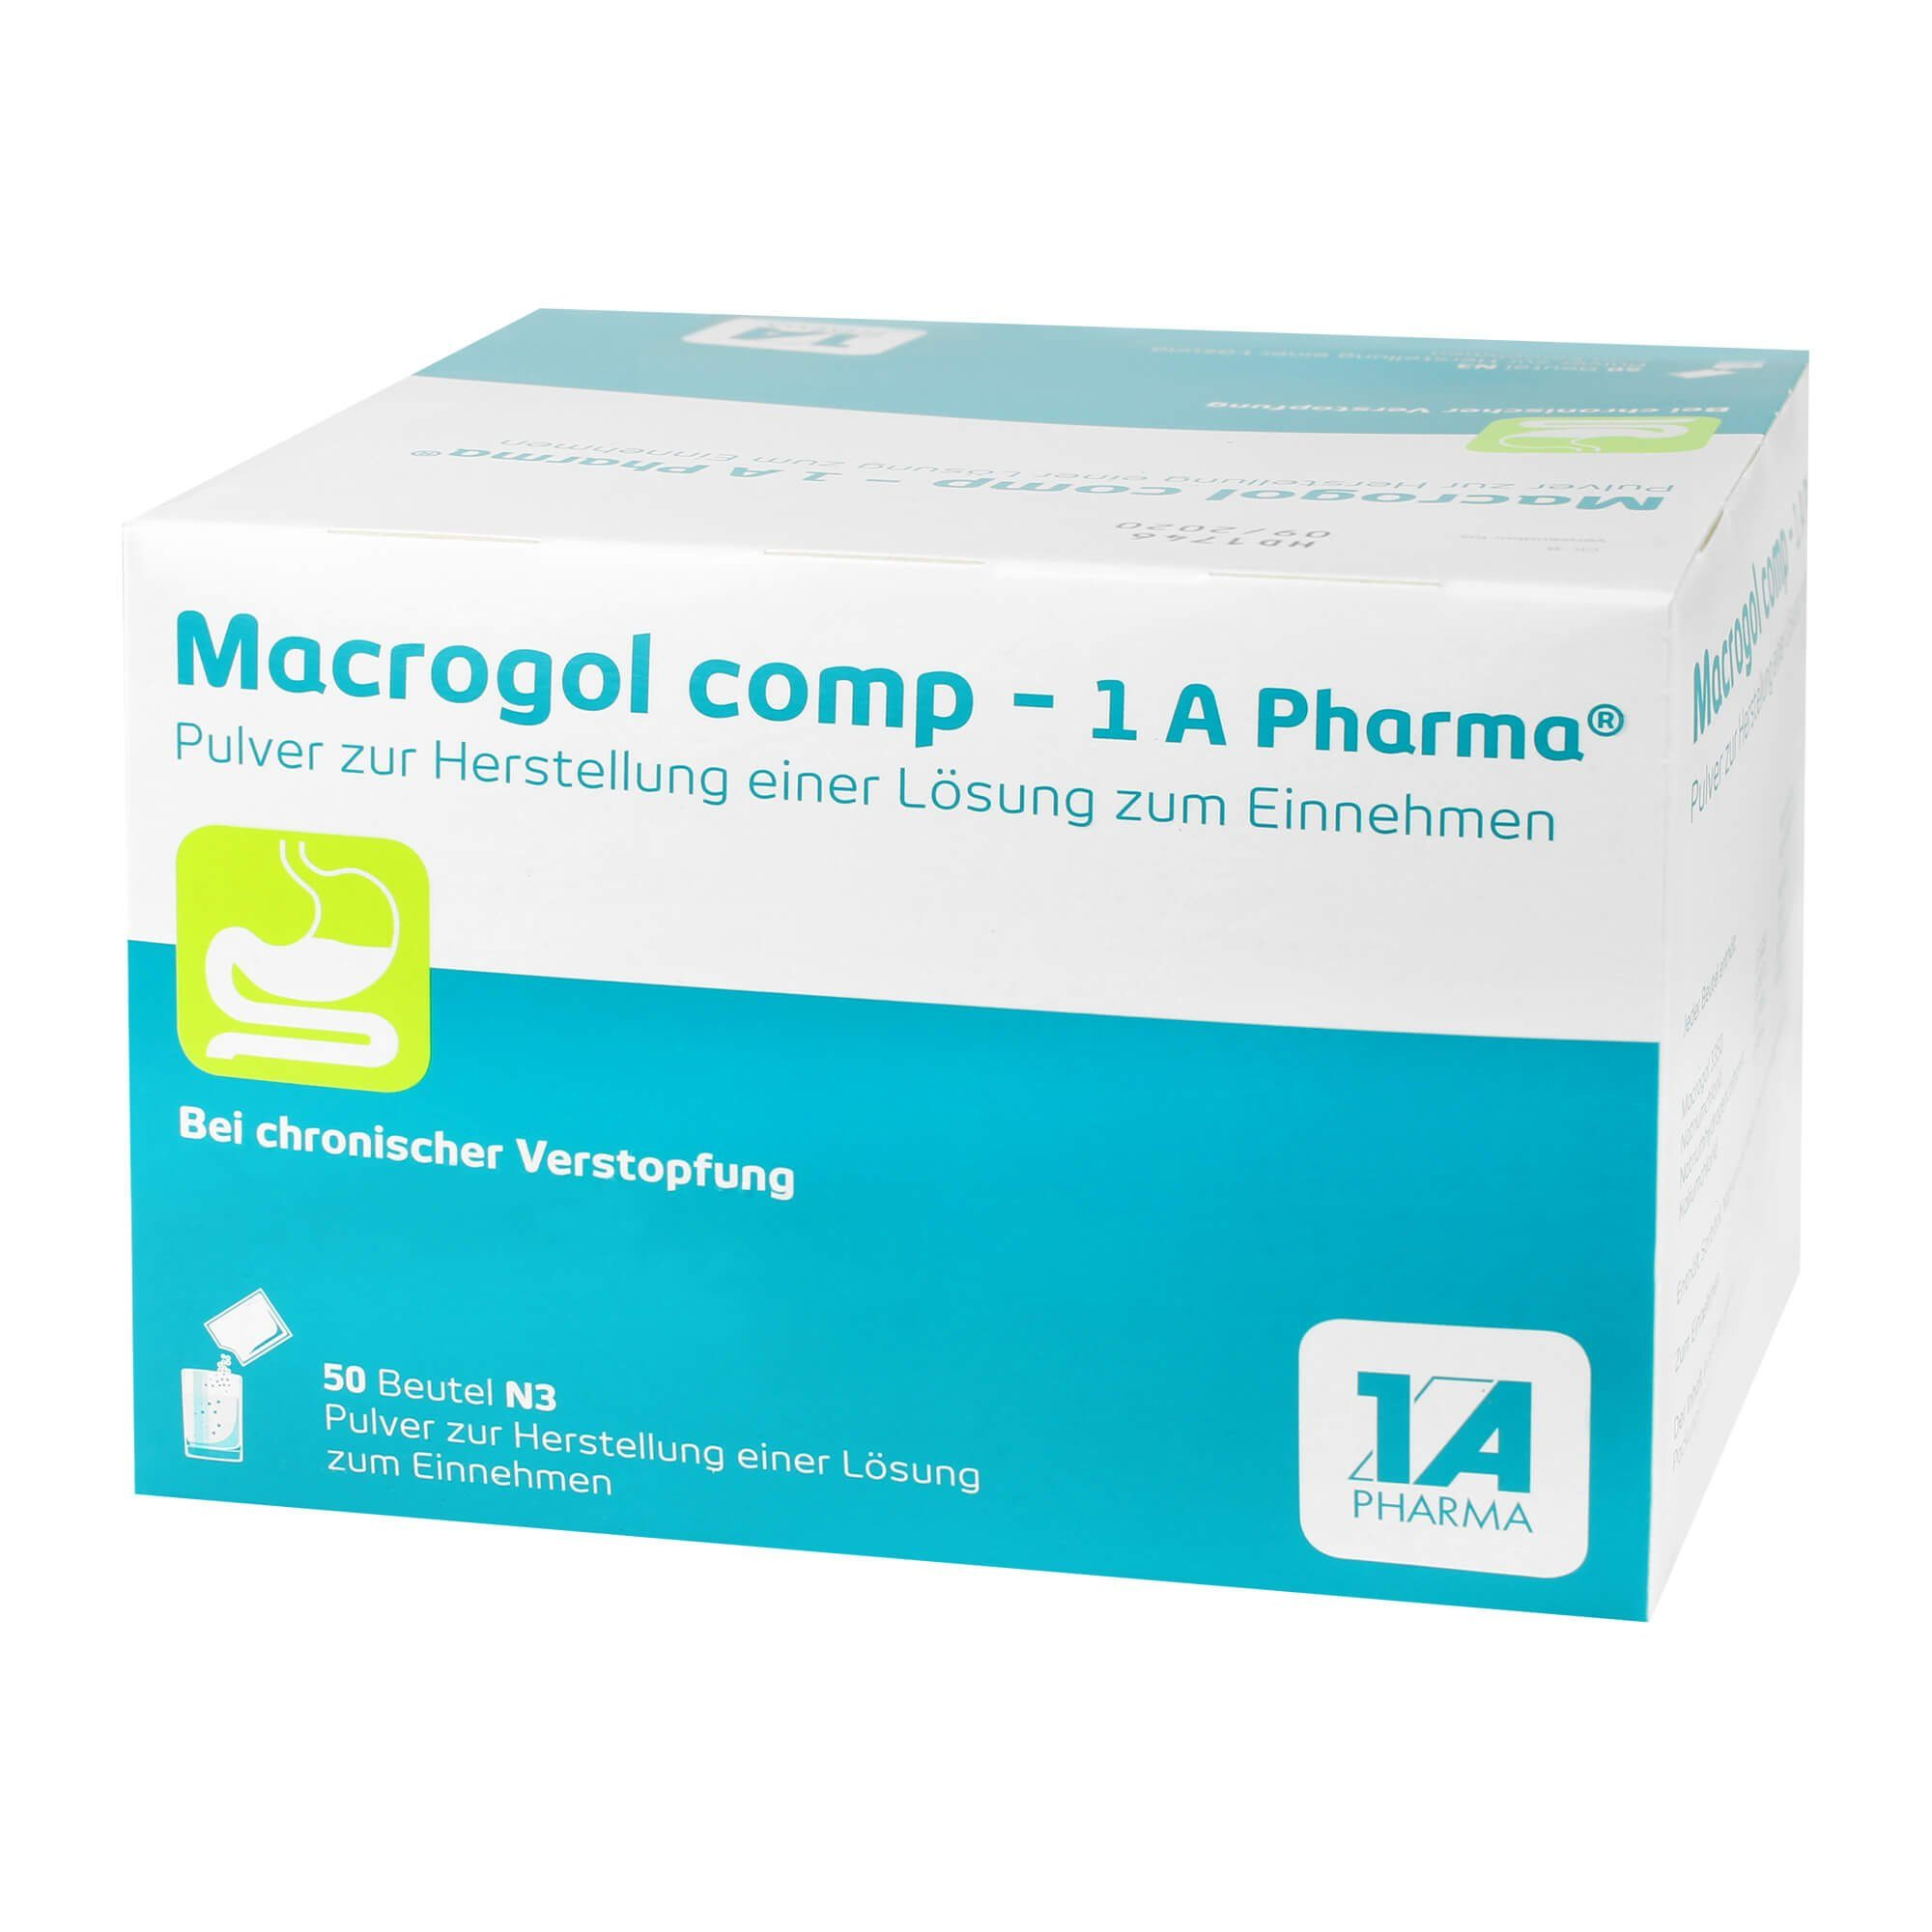 Macrogol Comp 1A Pharma Pulver , 50 St